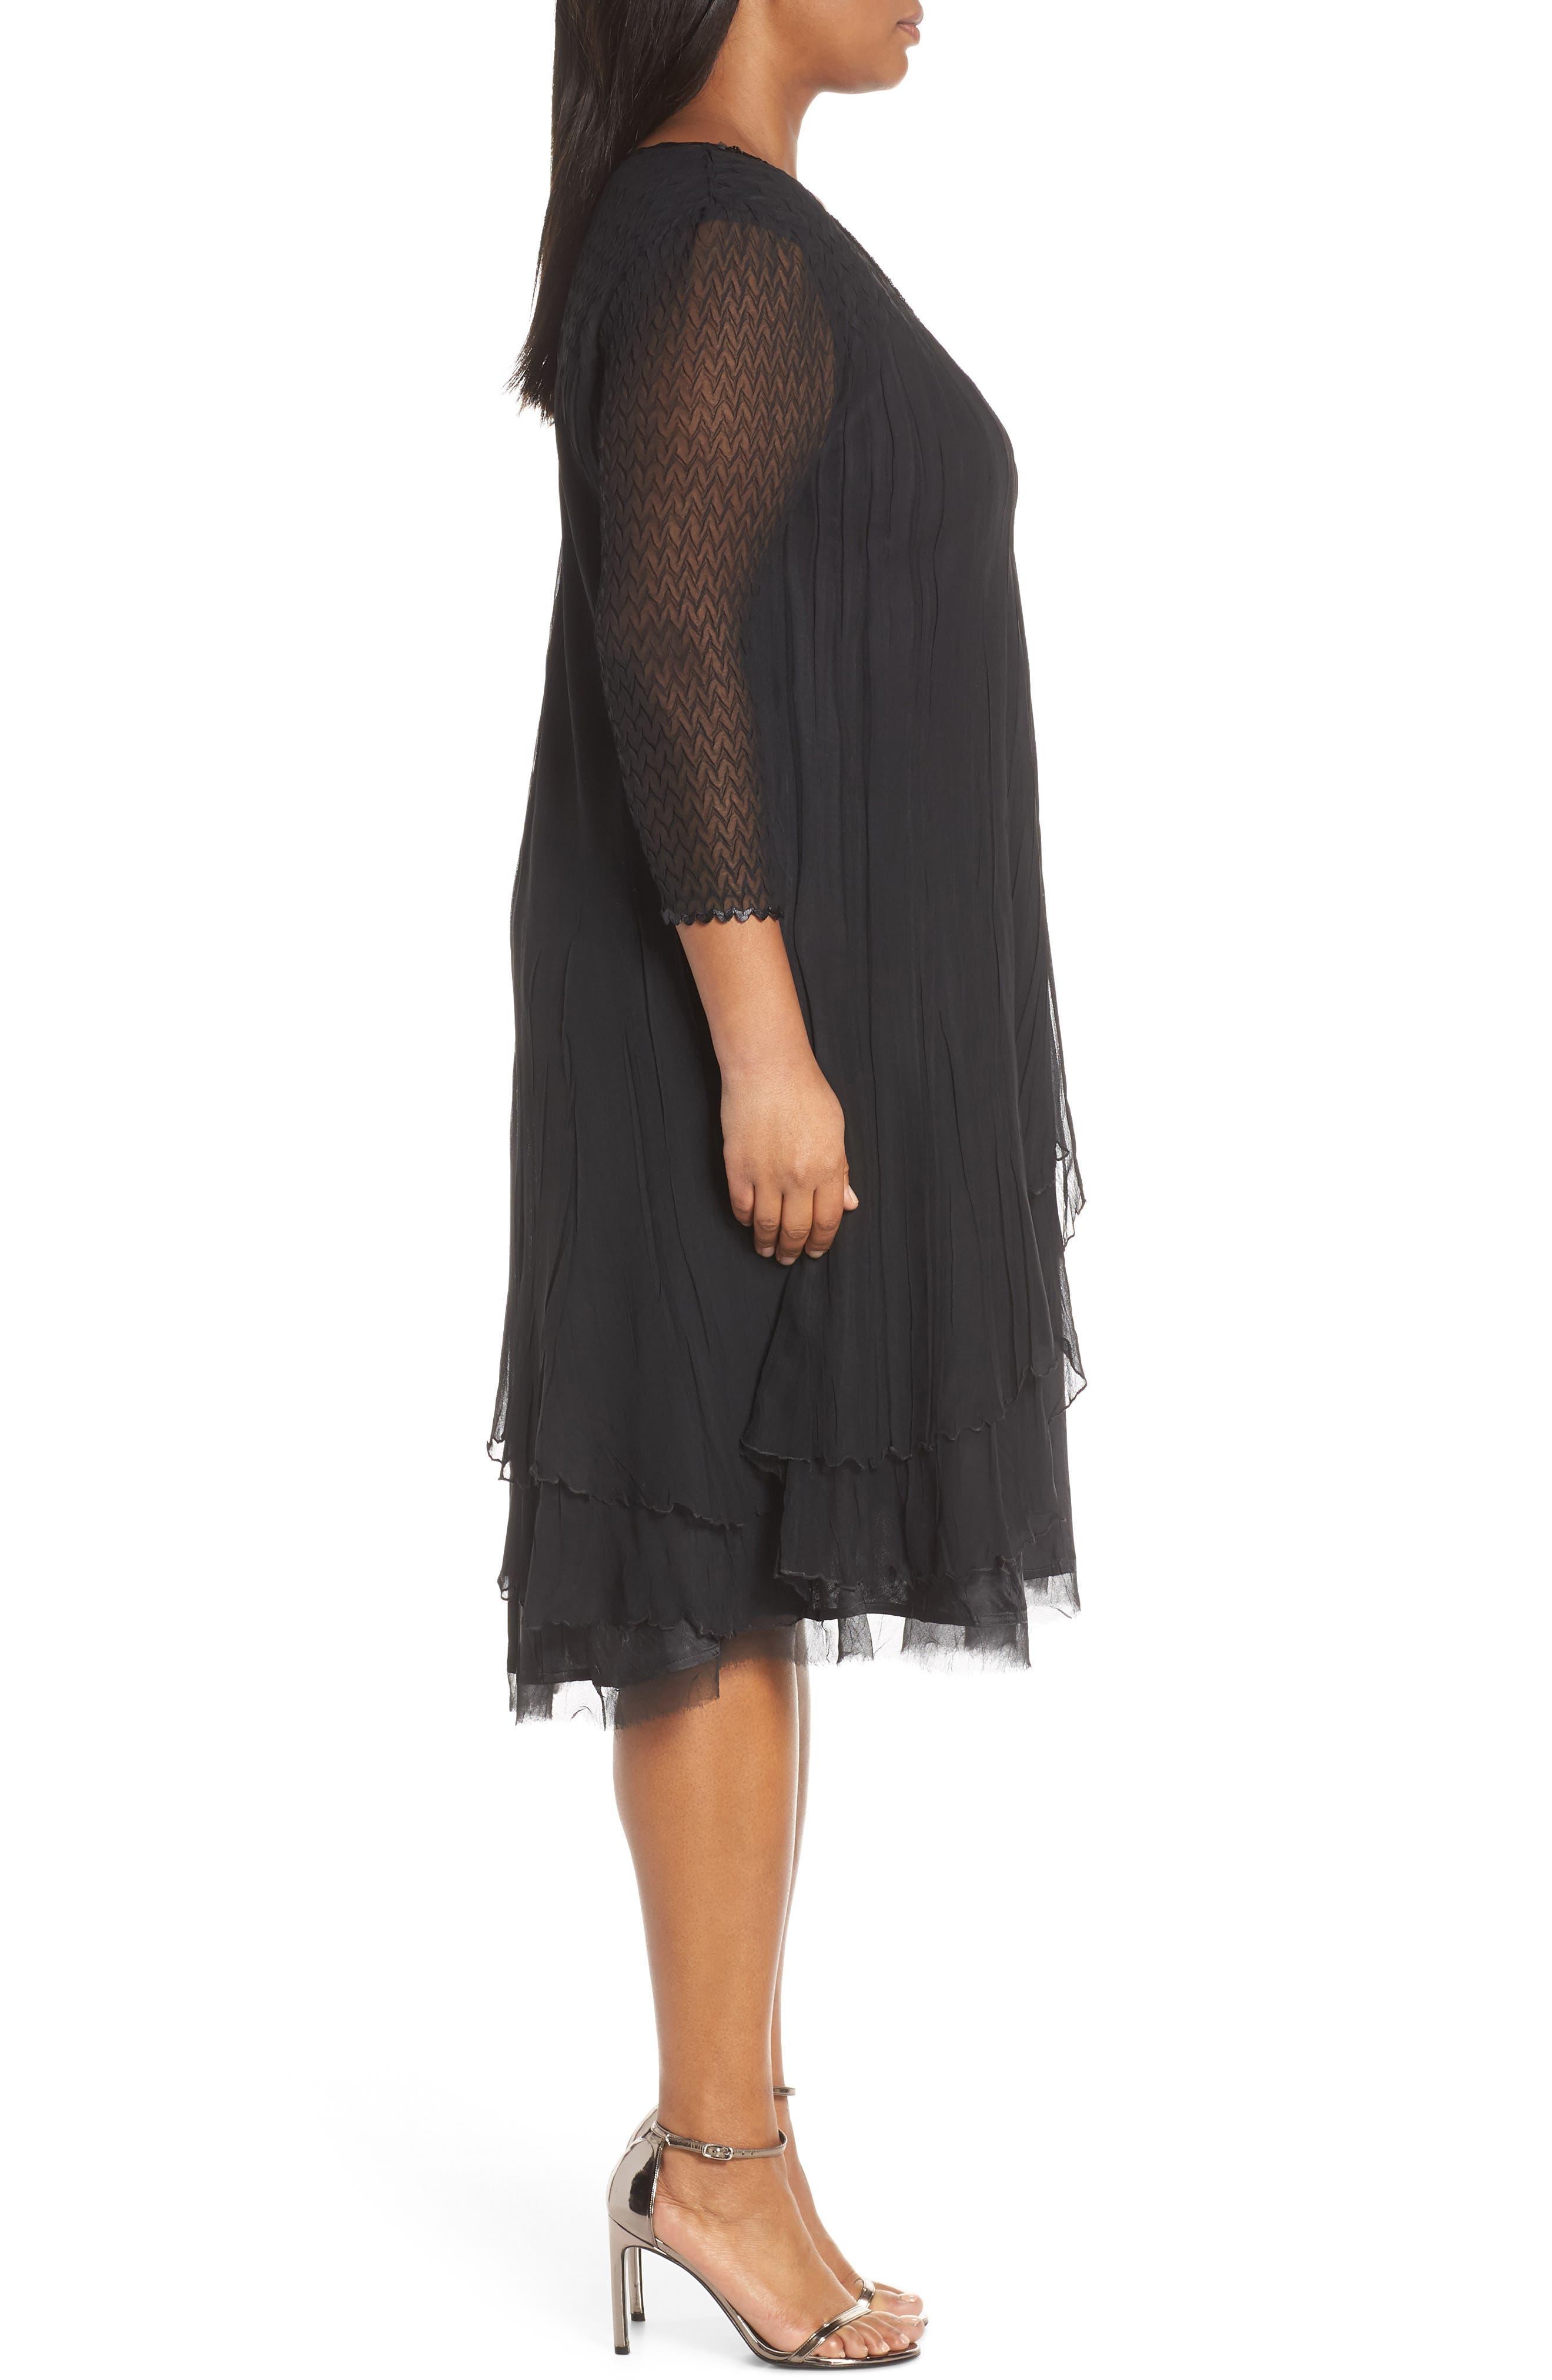 KOMAROV, Beaded Neck Chiffon Dress, Alternate thumbnail 4, color, 001